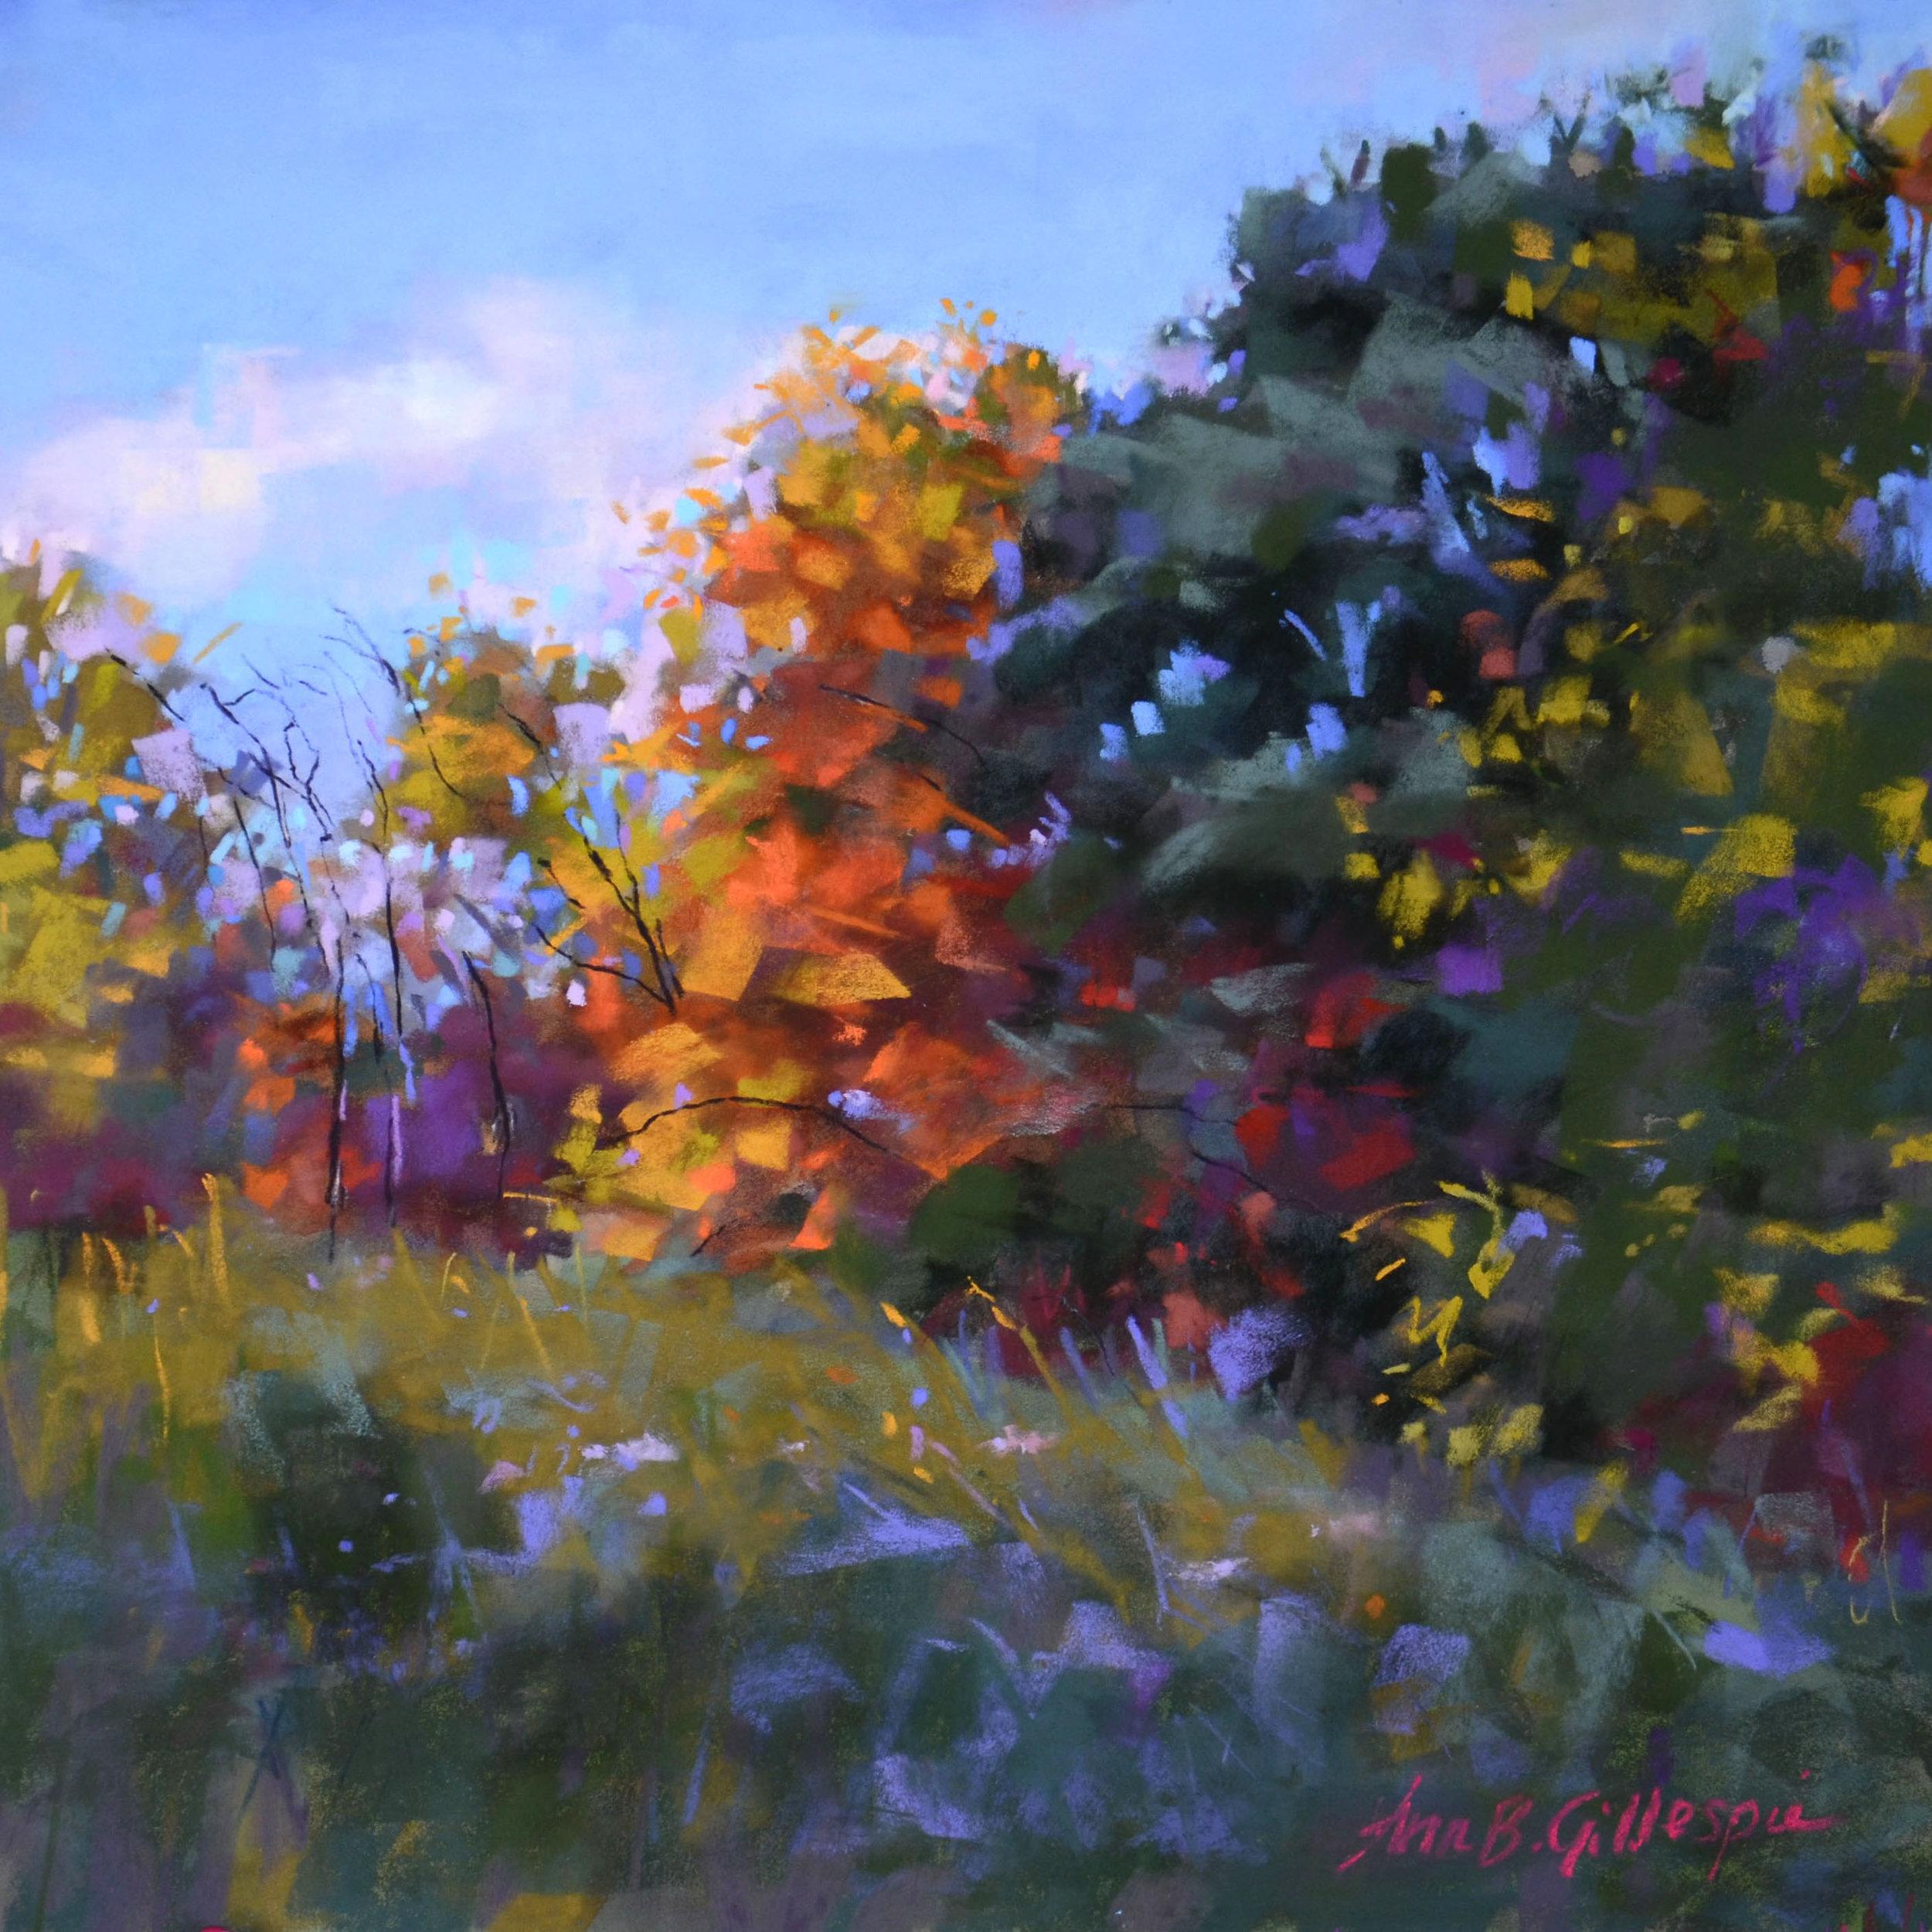 Autumn Beckoning